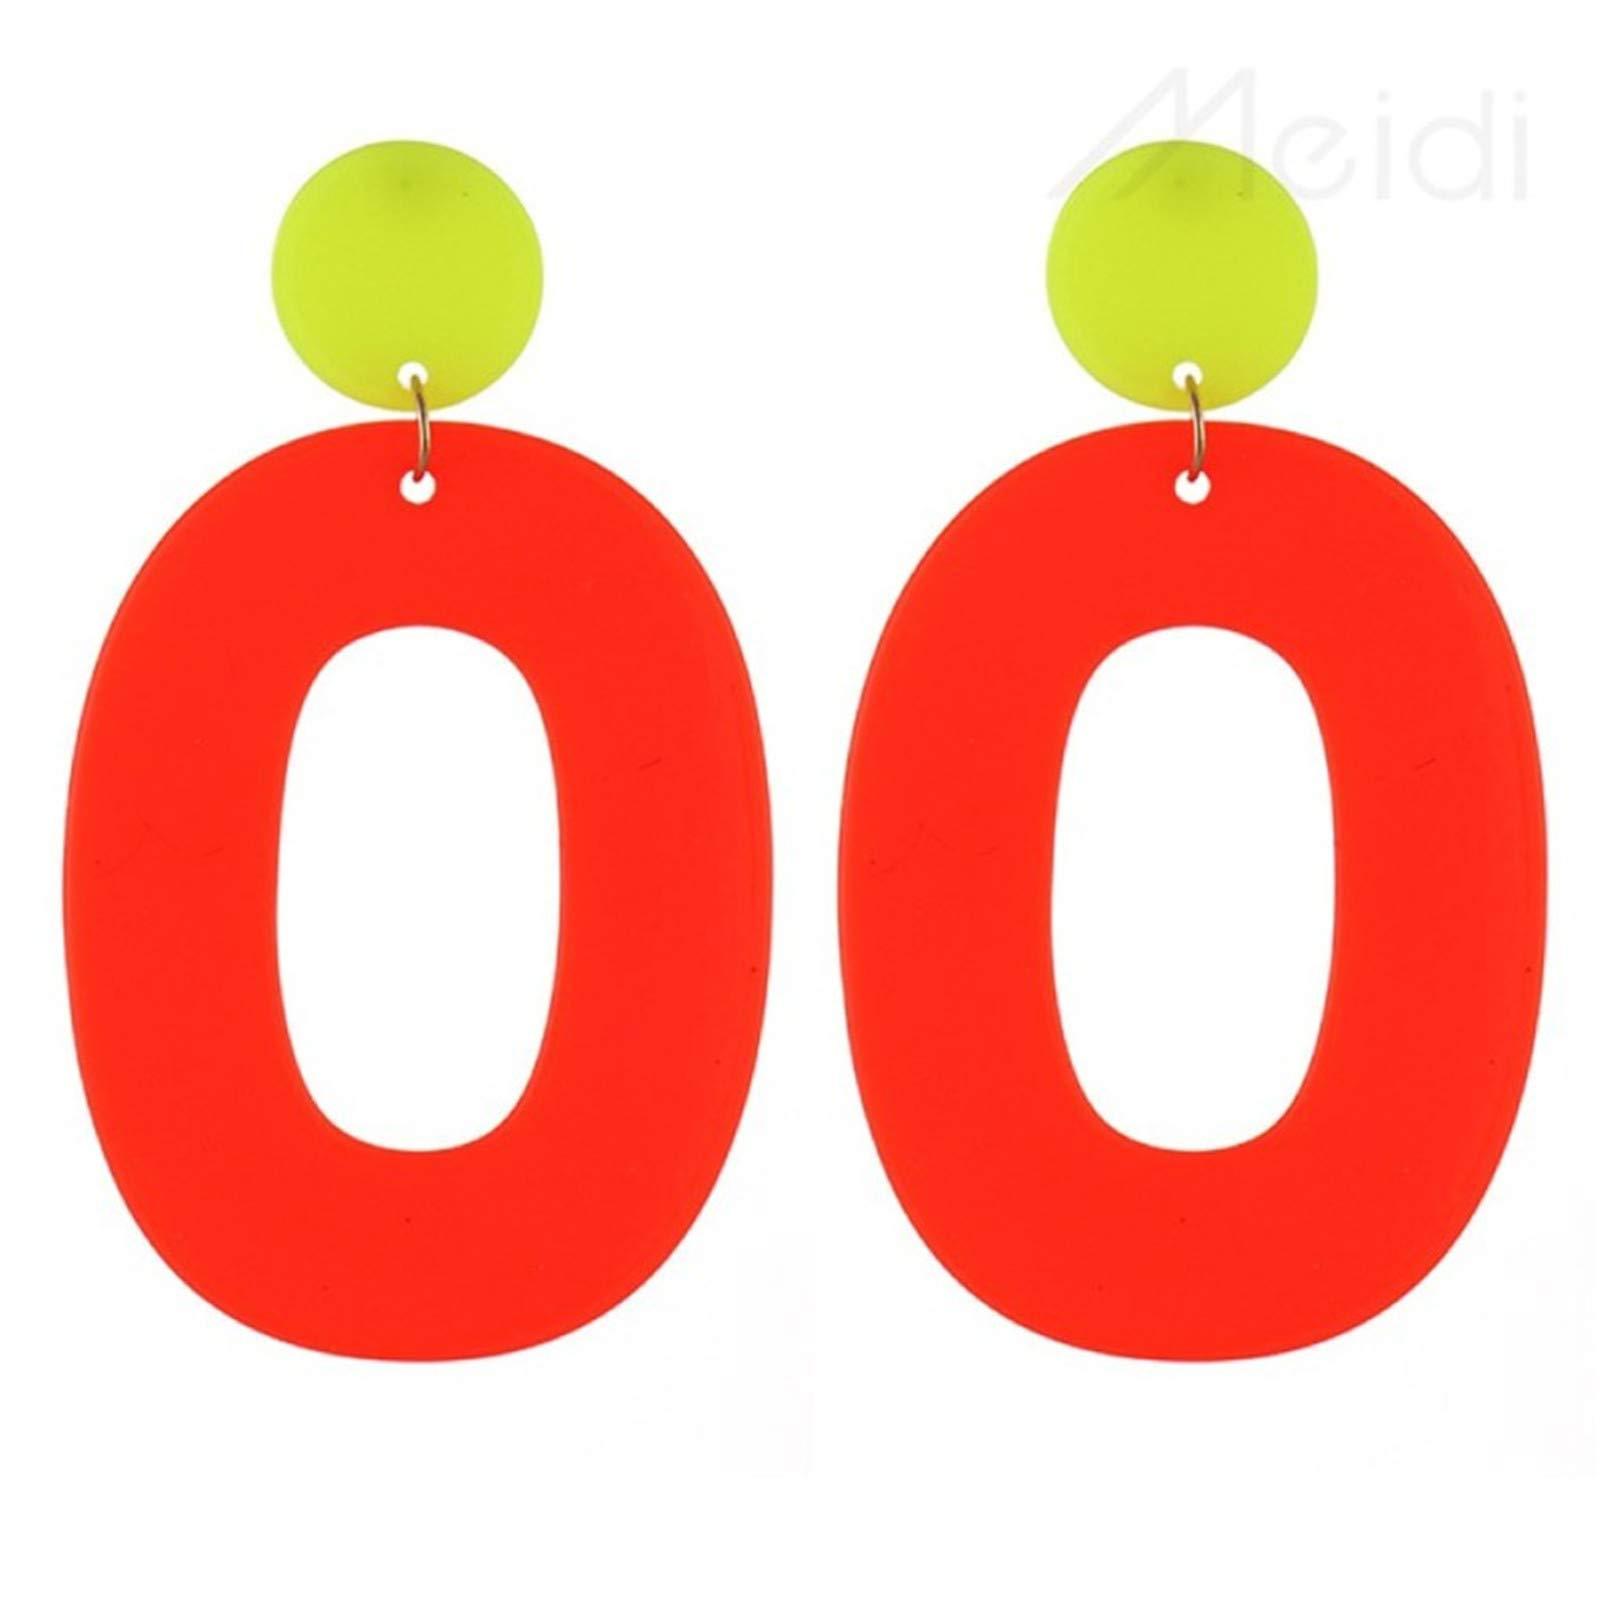 BOOBODA Hot Ladies Fashion Jewelry,Candy Fluorescent Earrings,Geometric Women Pendant(Orange)